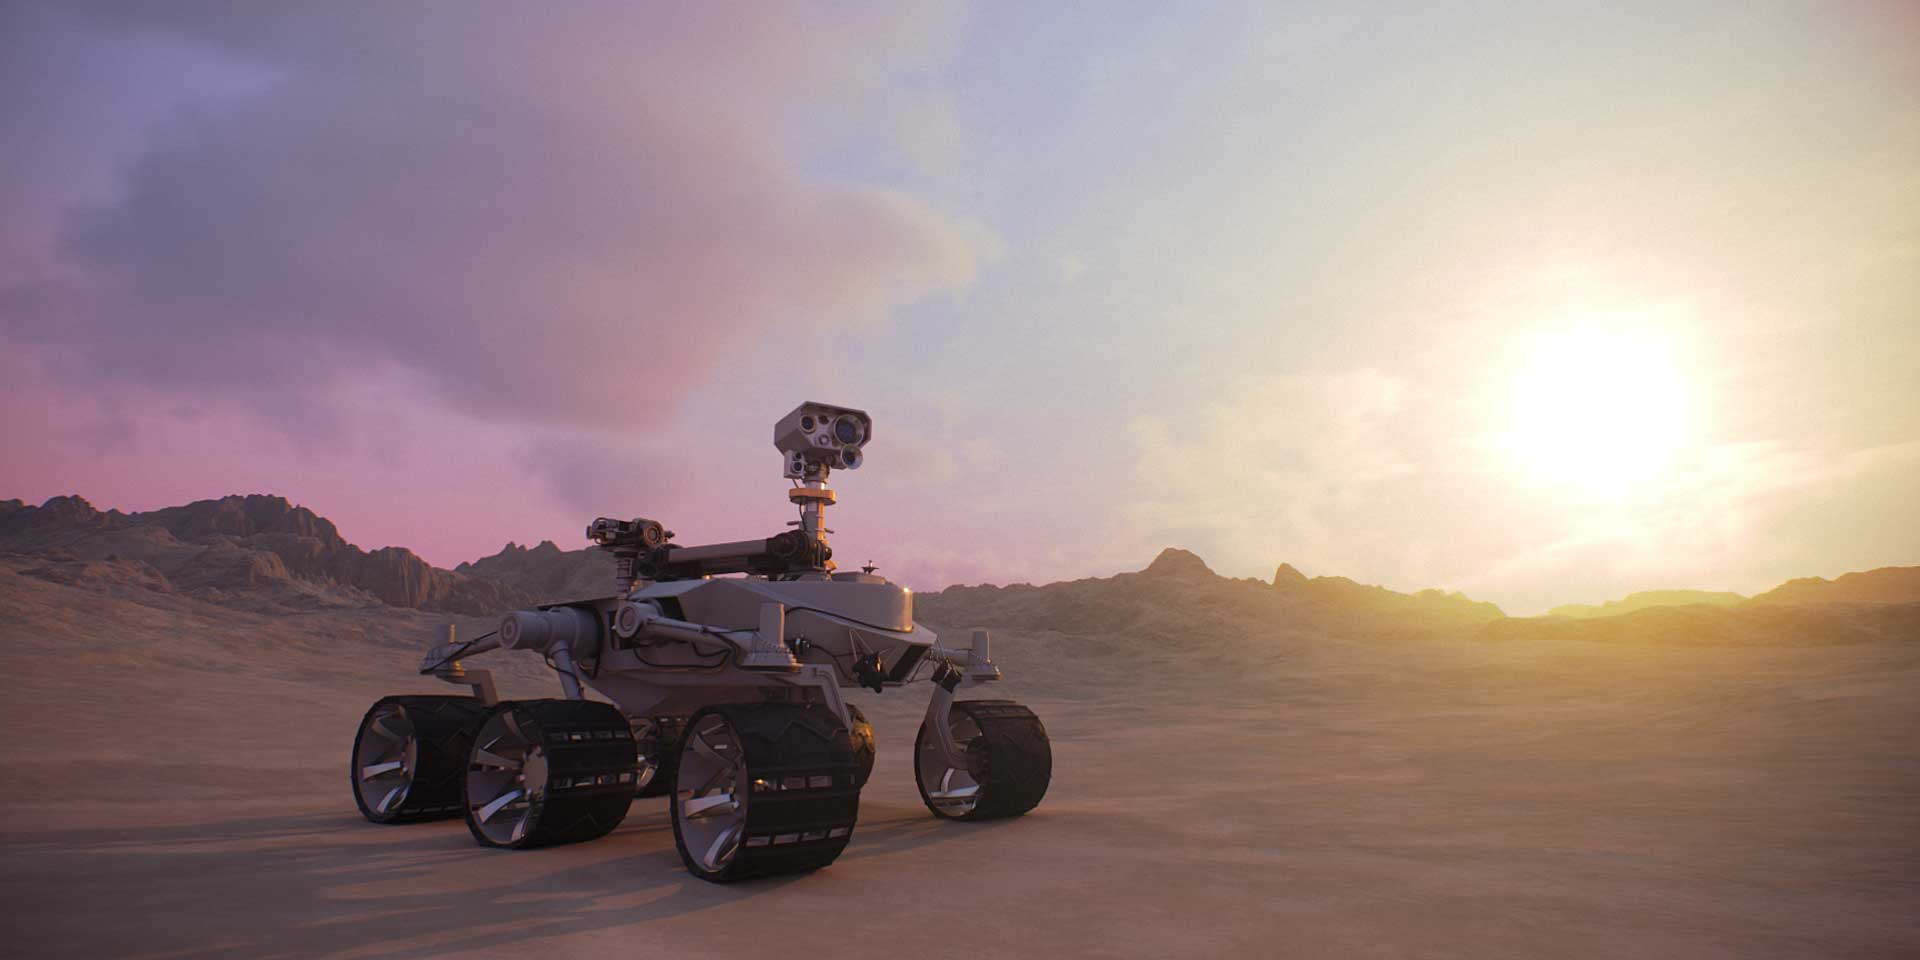 CG HDRI / Alien Skies from helloluxx by Shawn Astrom